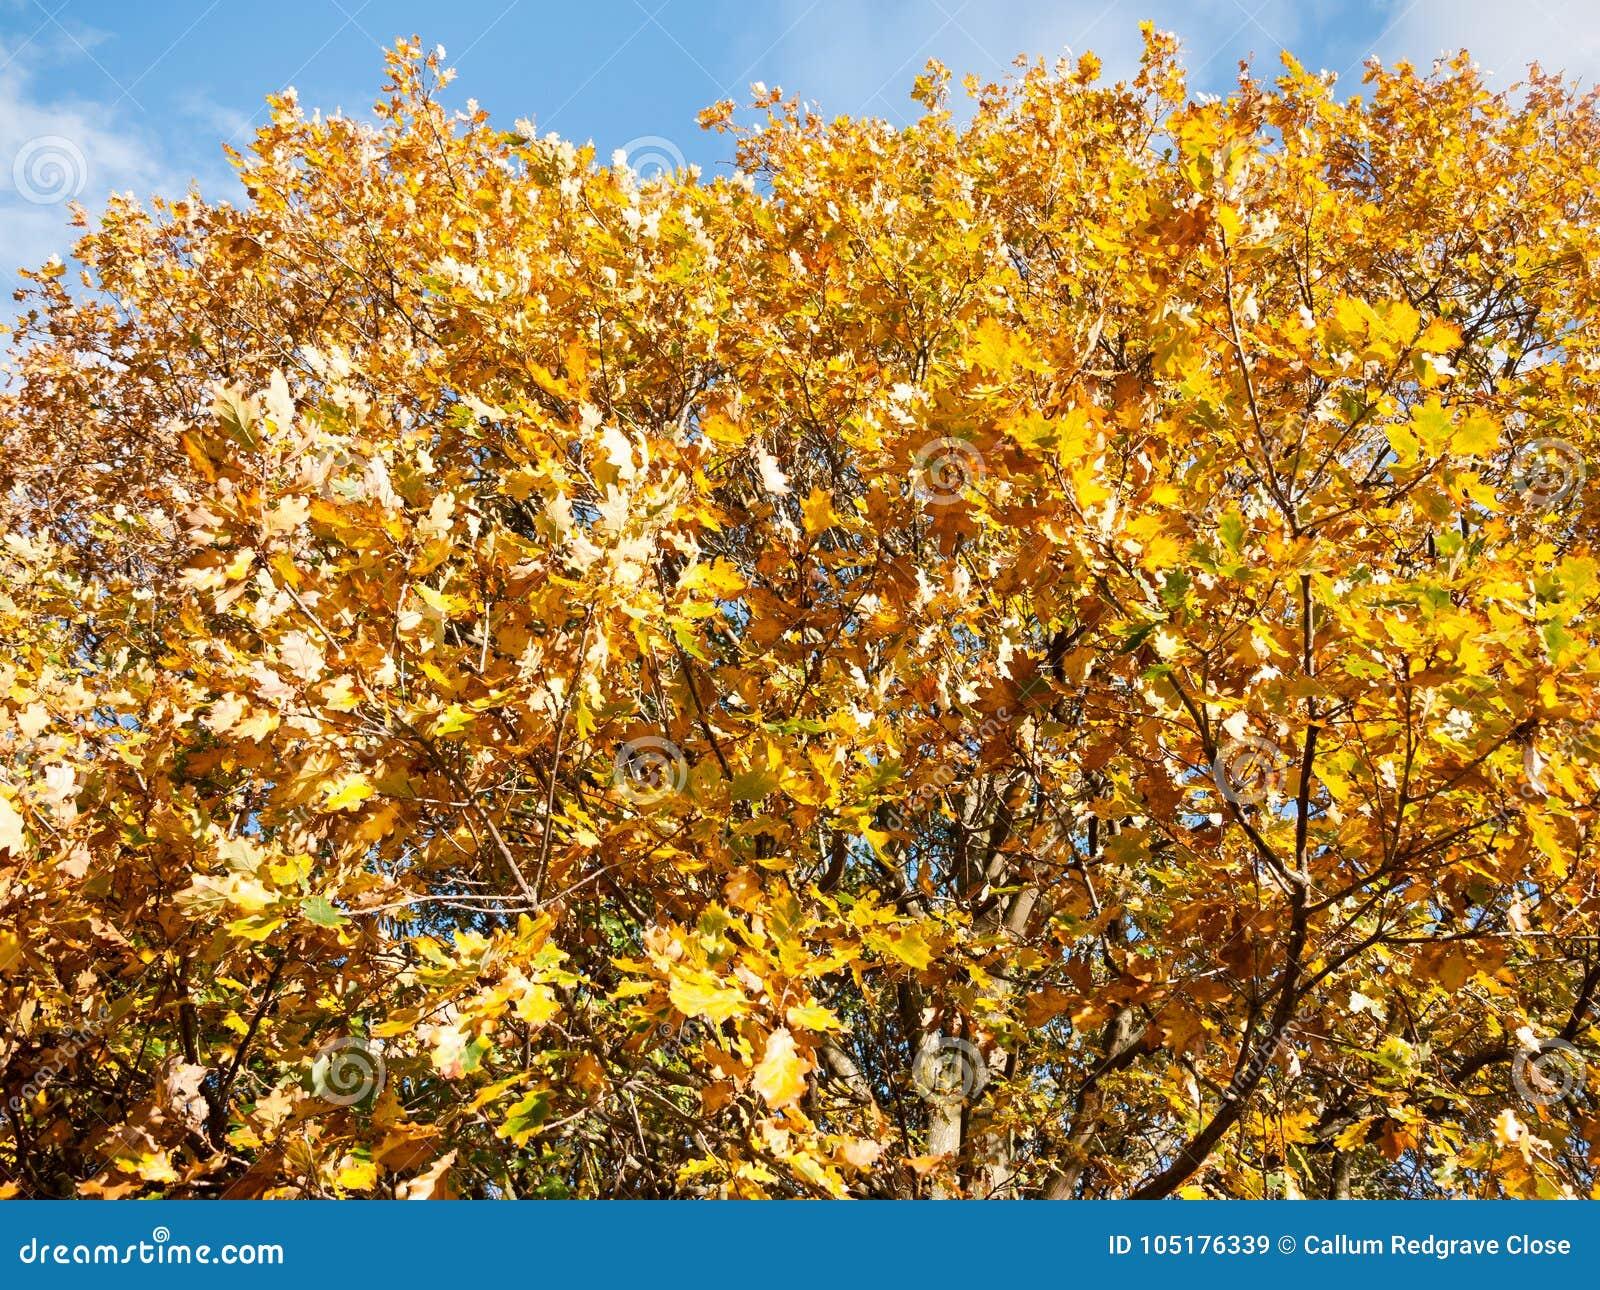 Beautiful close up yellow autumn leaves background tree stock image beautiful close up yellow autumn leaves background tree essex england uk mightylinksfo